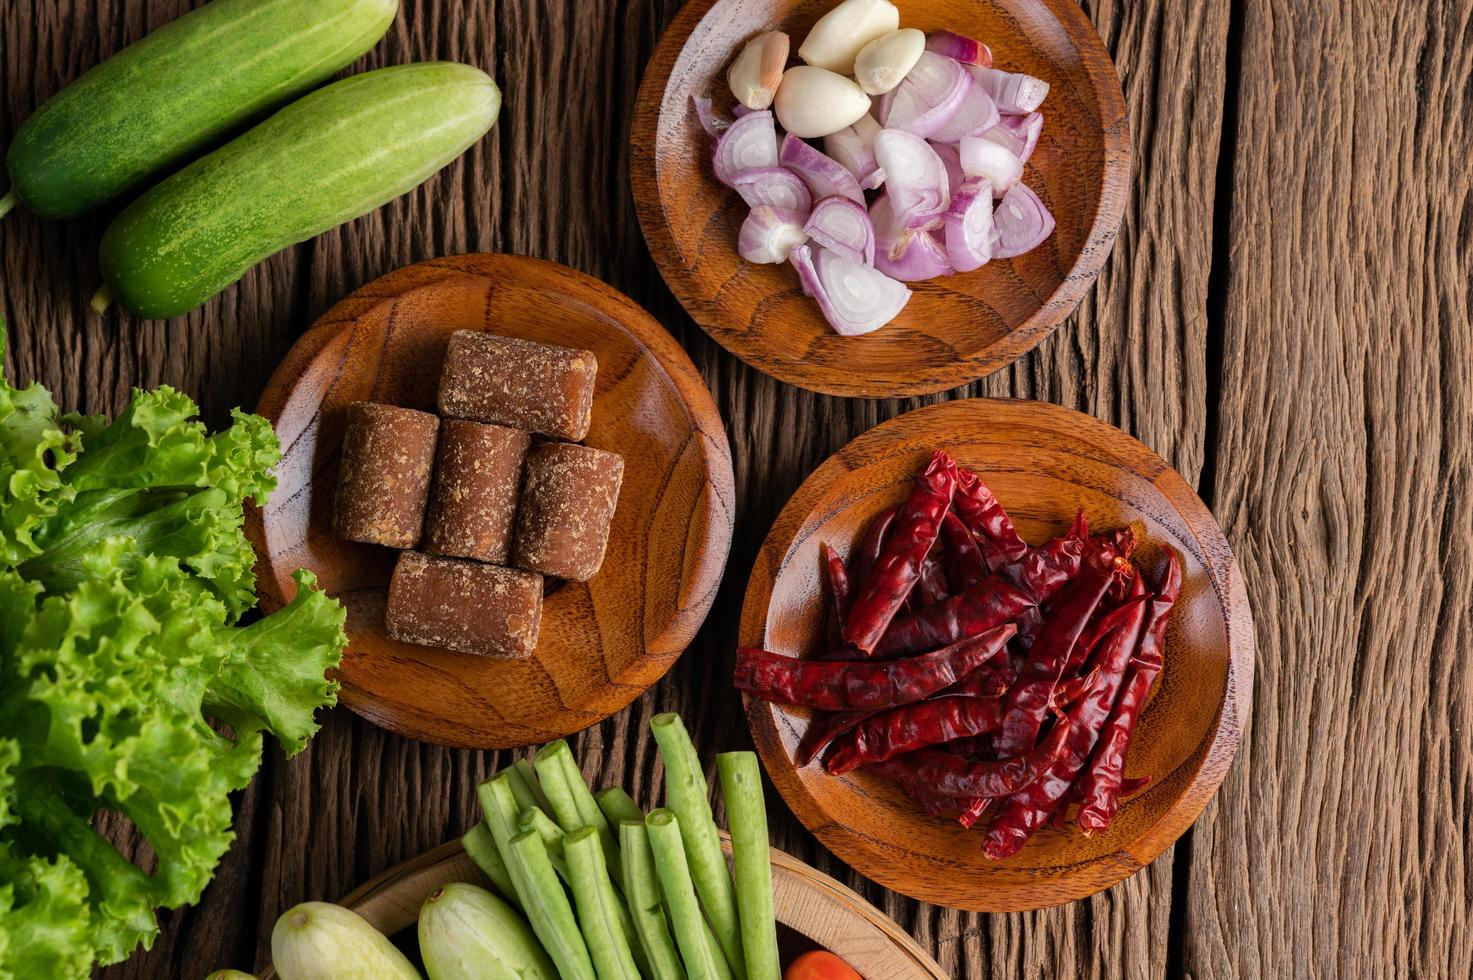 palmsuiker, rode uien, gedroogde paprika's, tomaten, komkommers, kousenband en sla foto